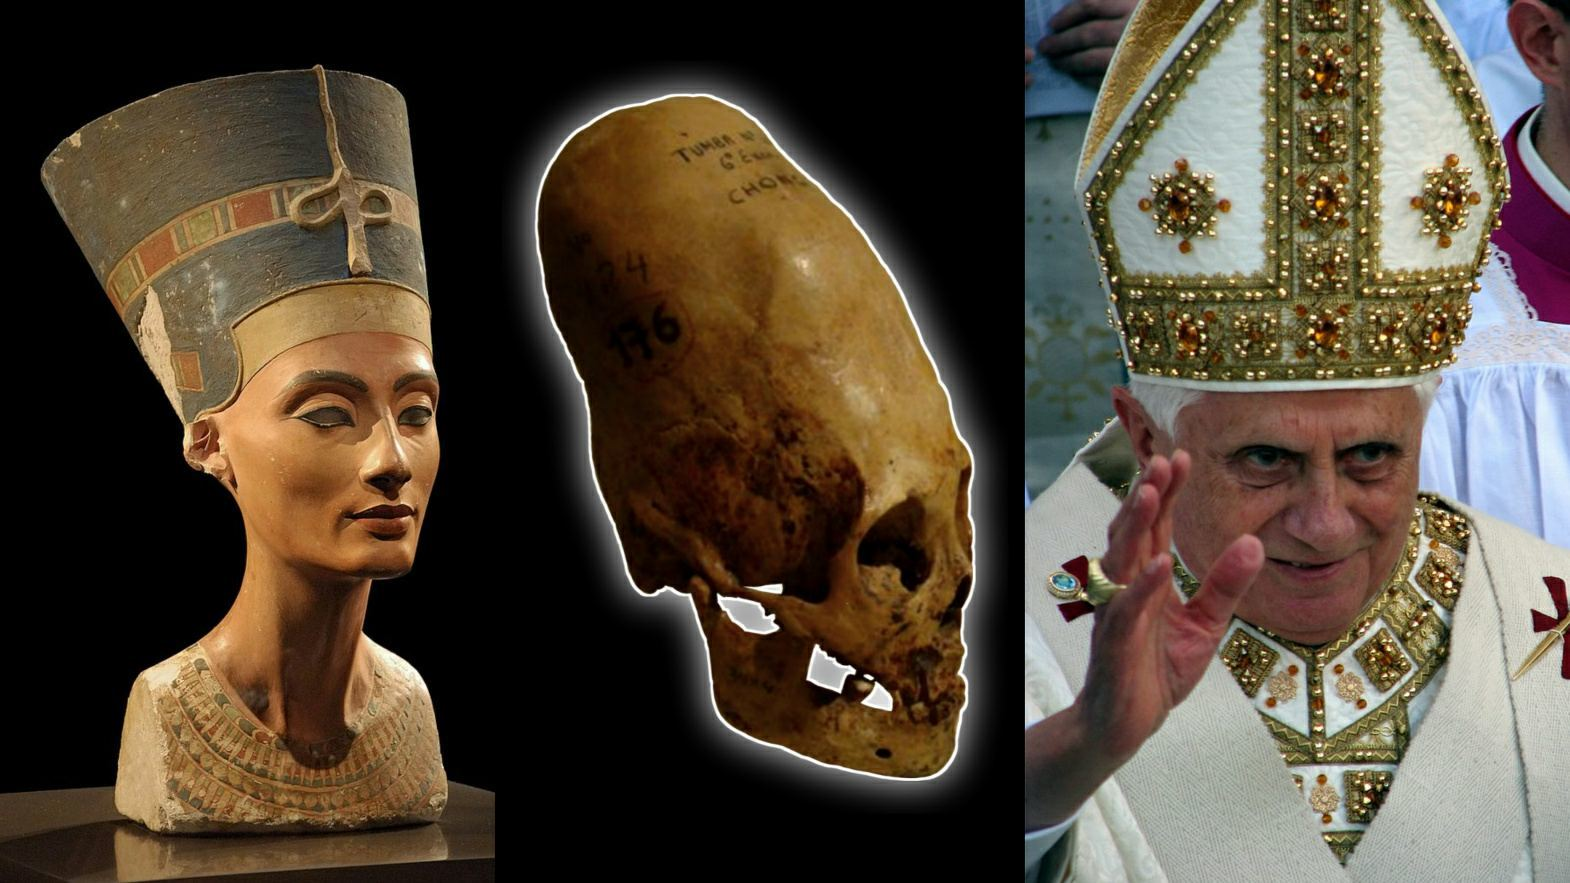 Queen Nefertiti, elongated skulls and the Pope's miter